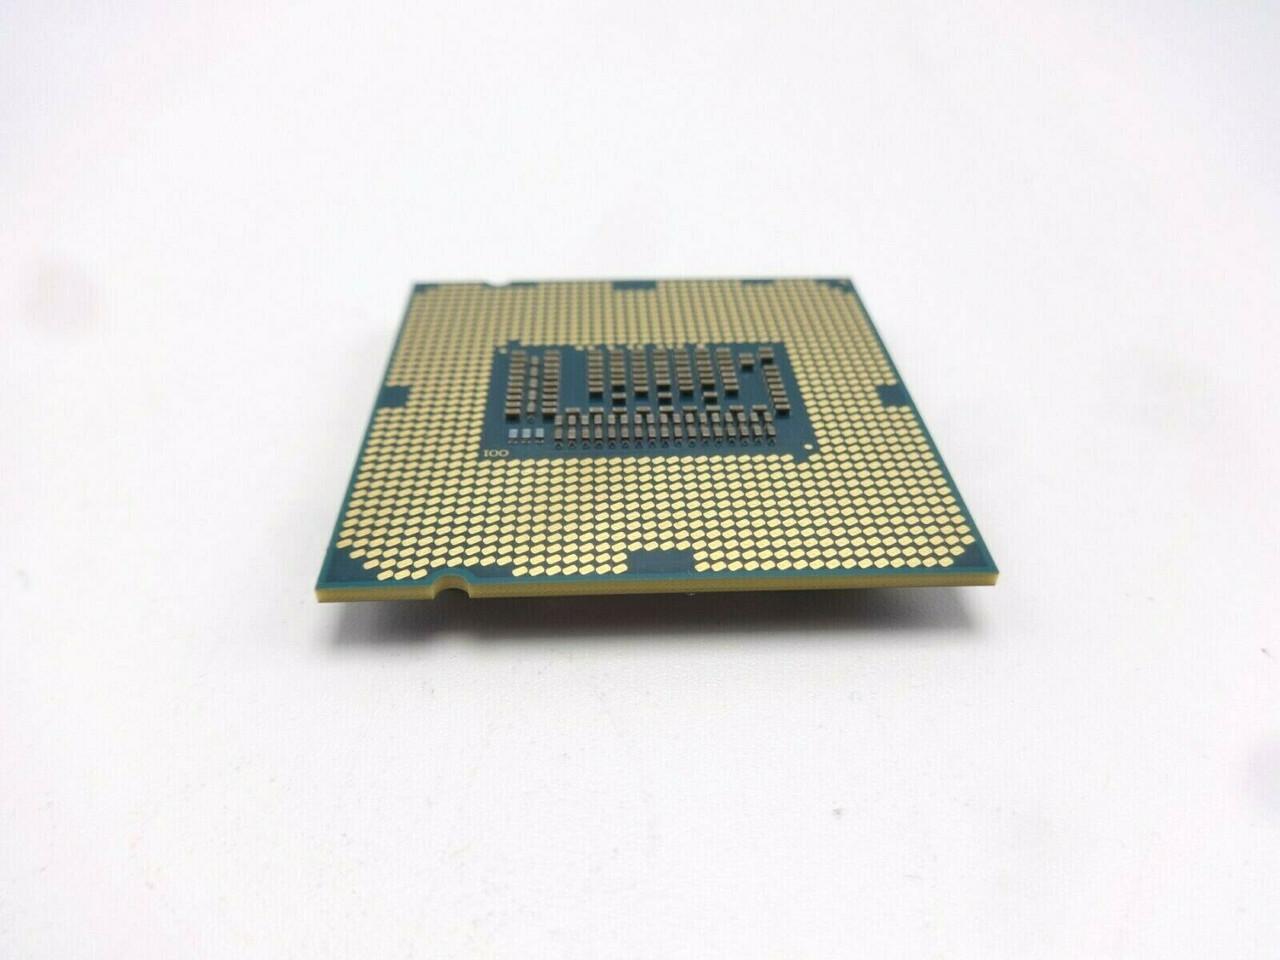 Intel Xeon SR0P4 Quad Core 3.3GHz E3-1230 V2 8MB Processor